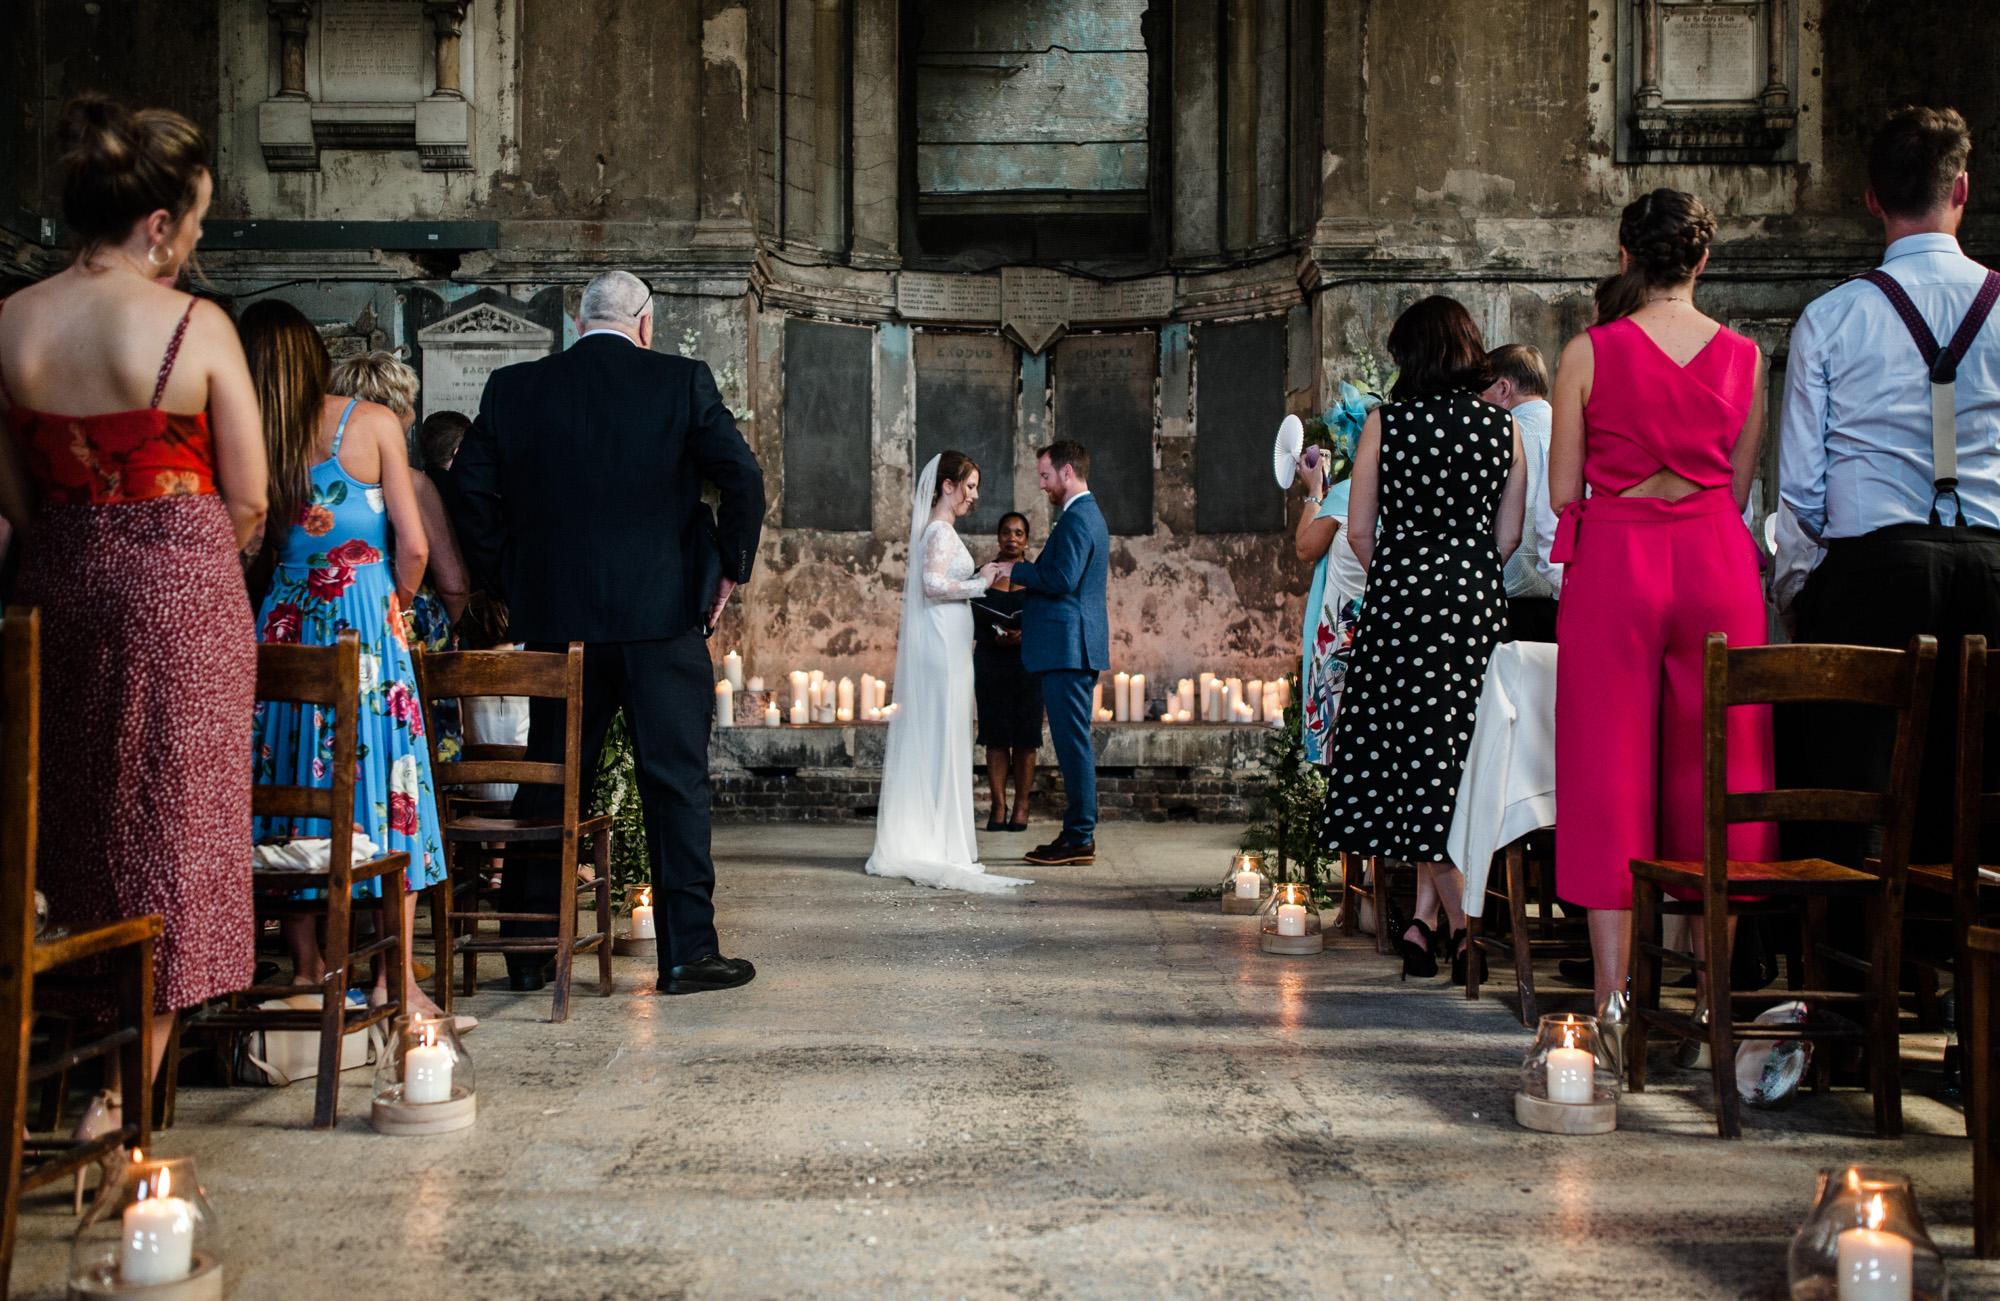 London Wedding photography 04.10.18 25.jpg